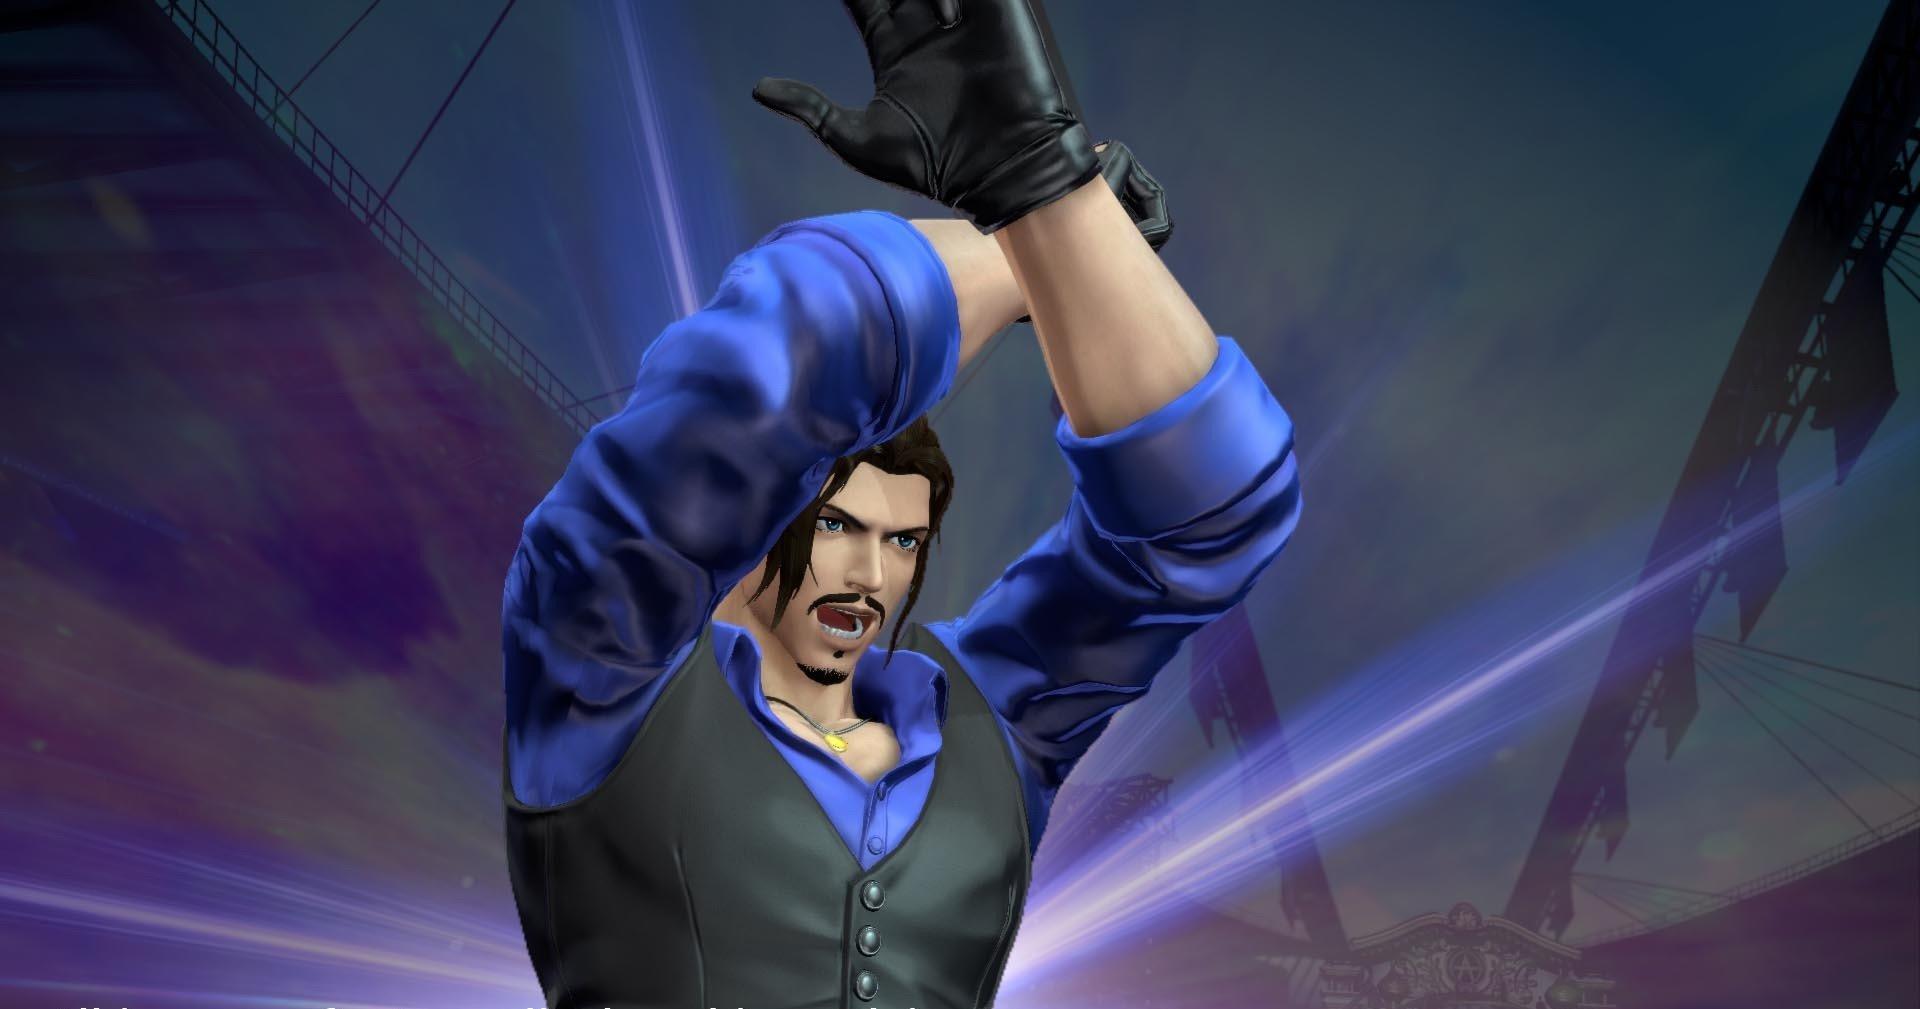 King of Fighter IV | Robert Garcia